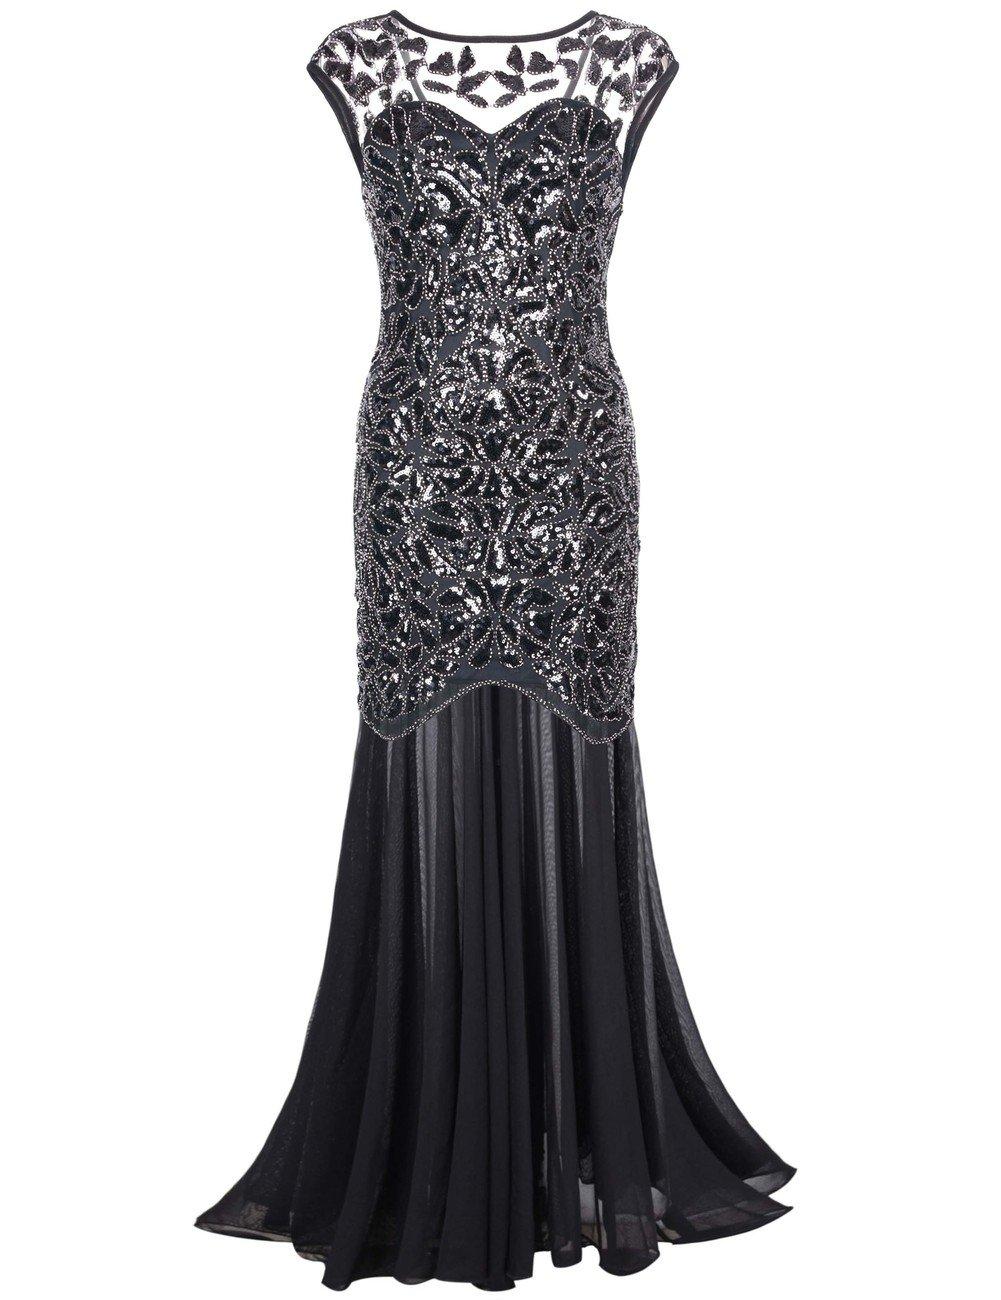 kayamiya Women's 20s Beaded Floral Maxi Long Gatsby Flapper Prom Dress M Black